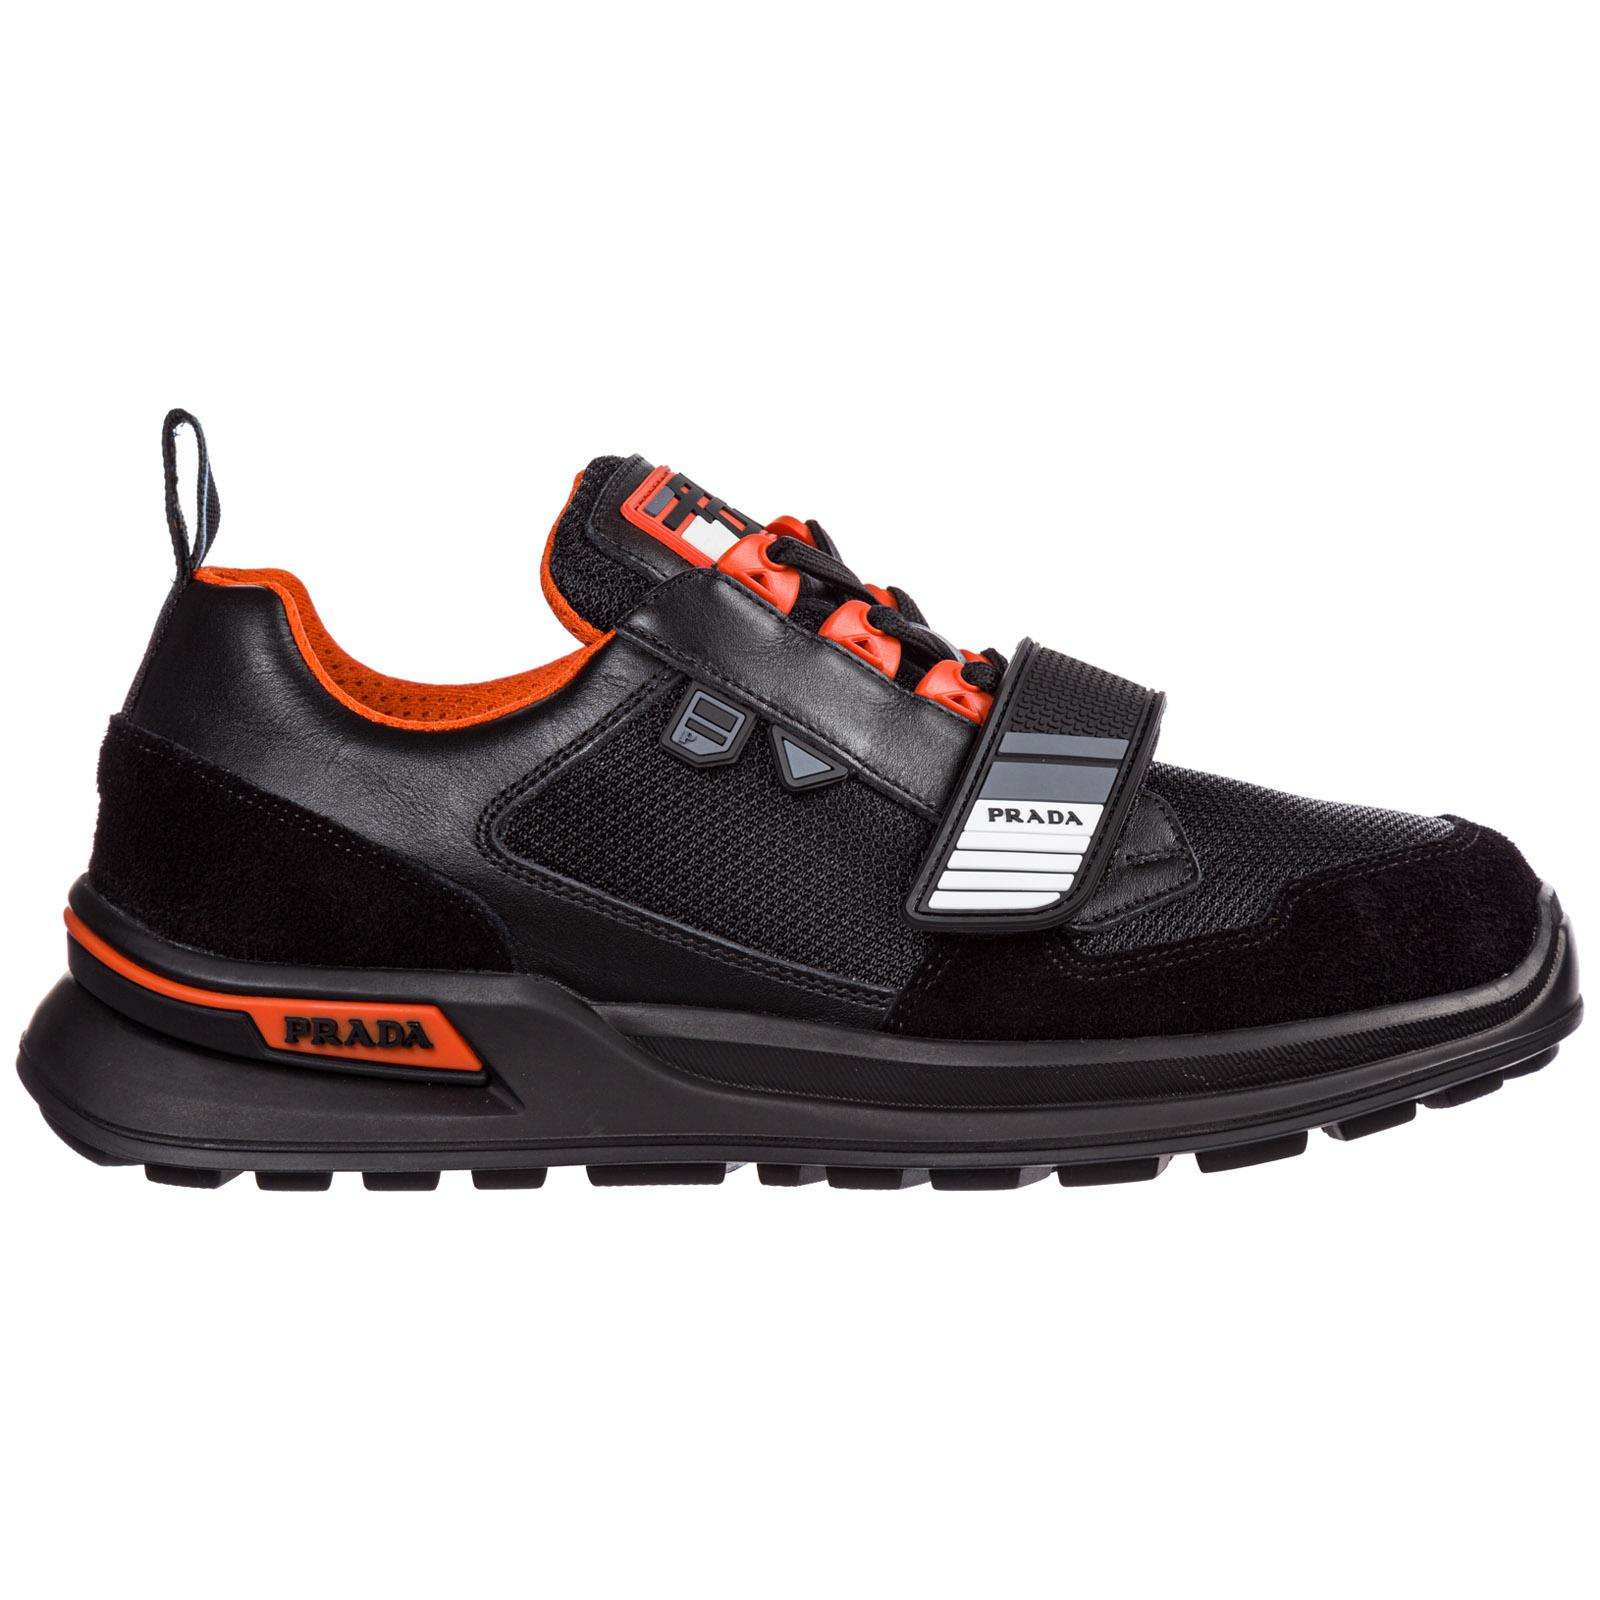 Prada Mechano Sneakers In Black Leather